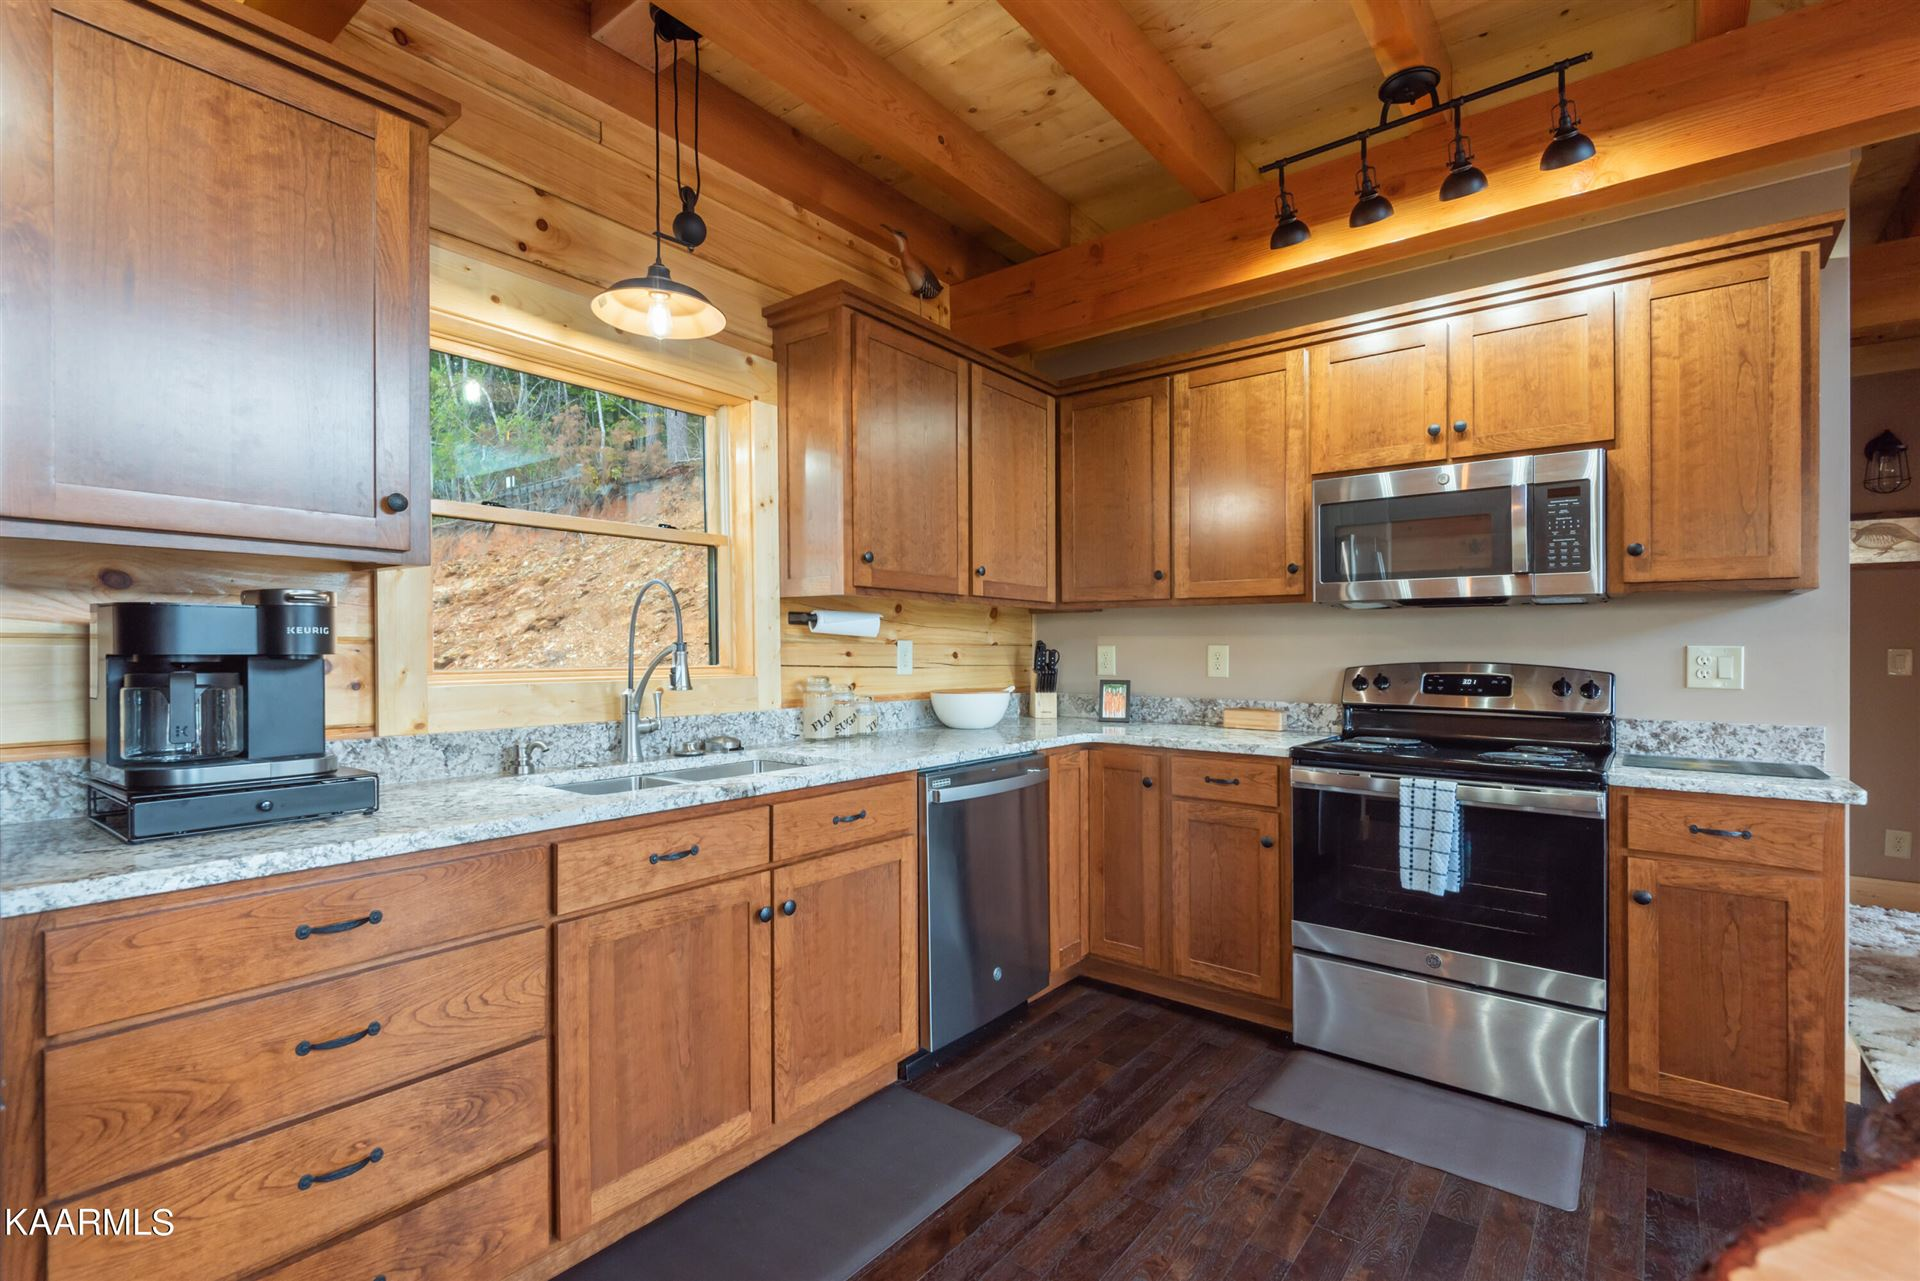 Photo of 1652 Spring Creek Rd, Reliance, TN 37369 (MLS # 1171587)